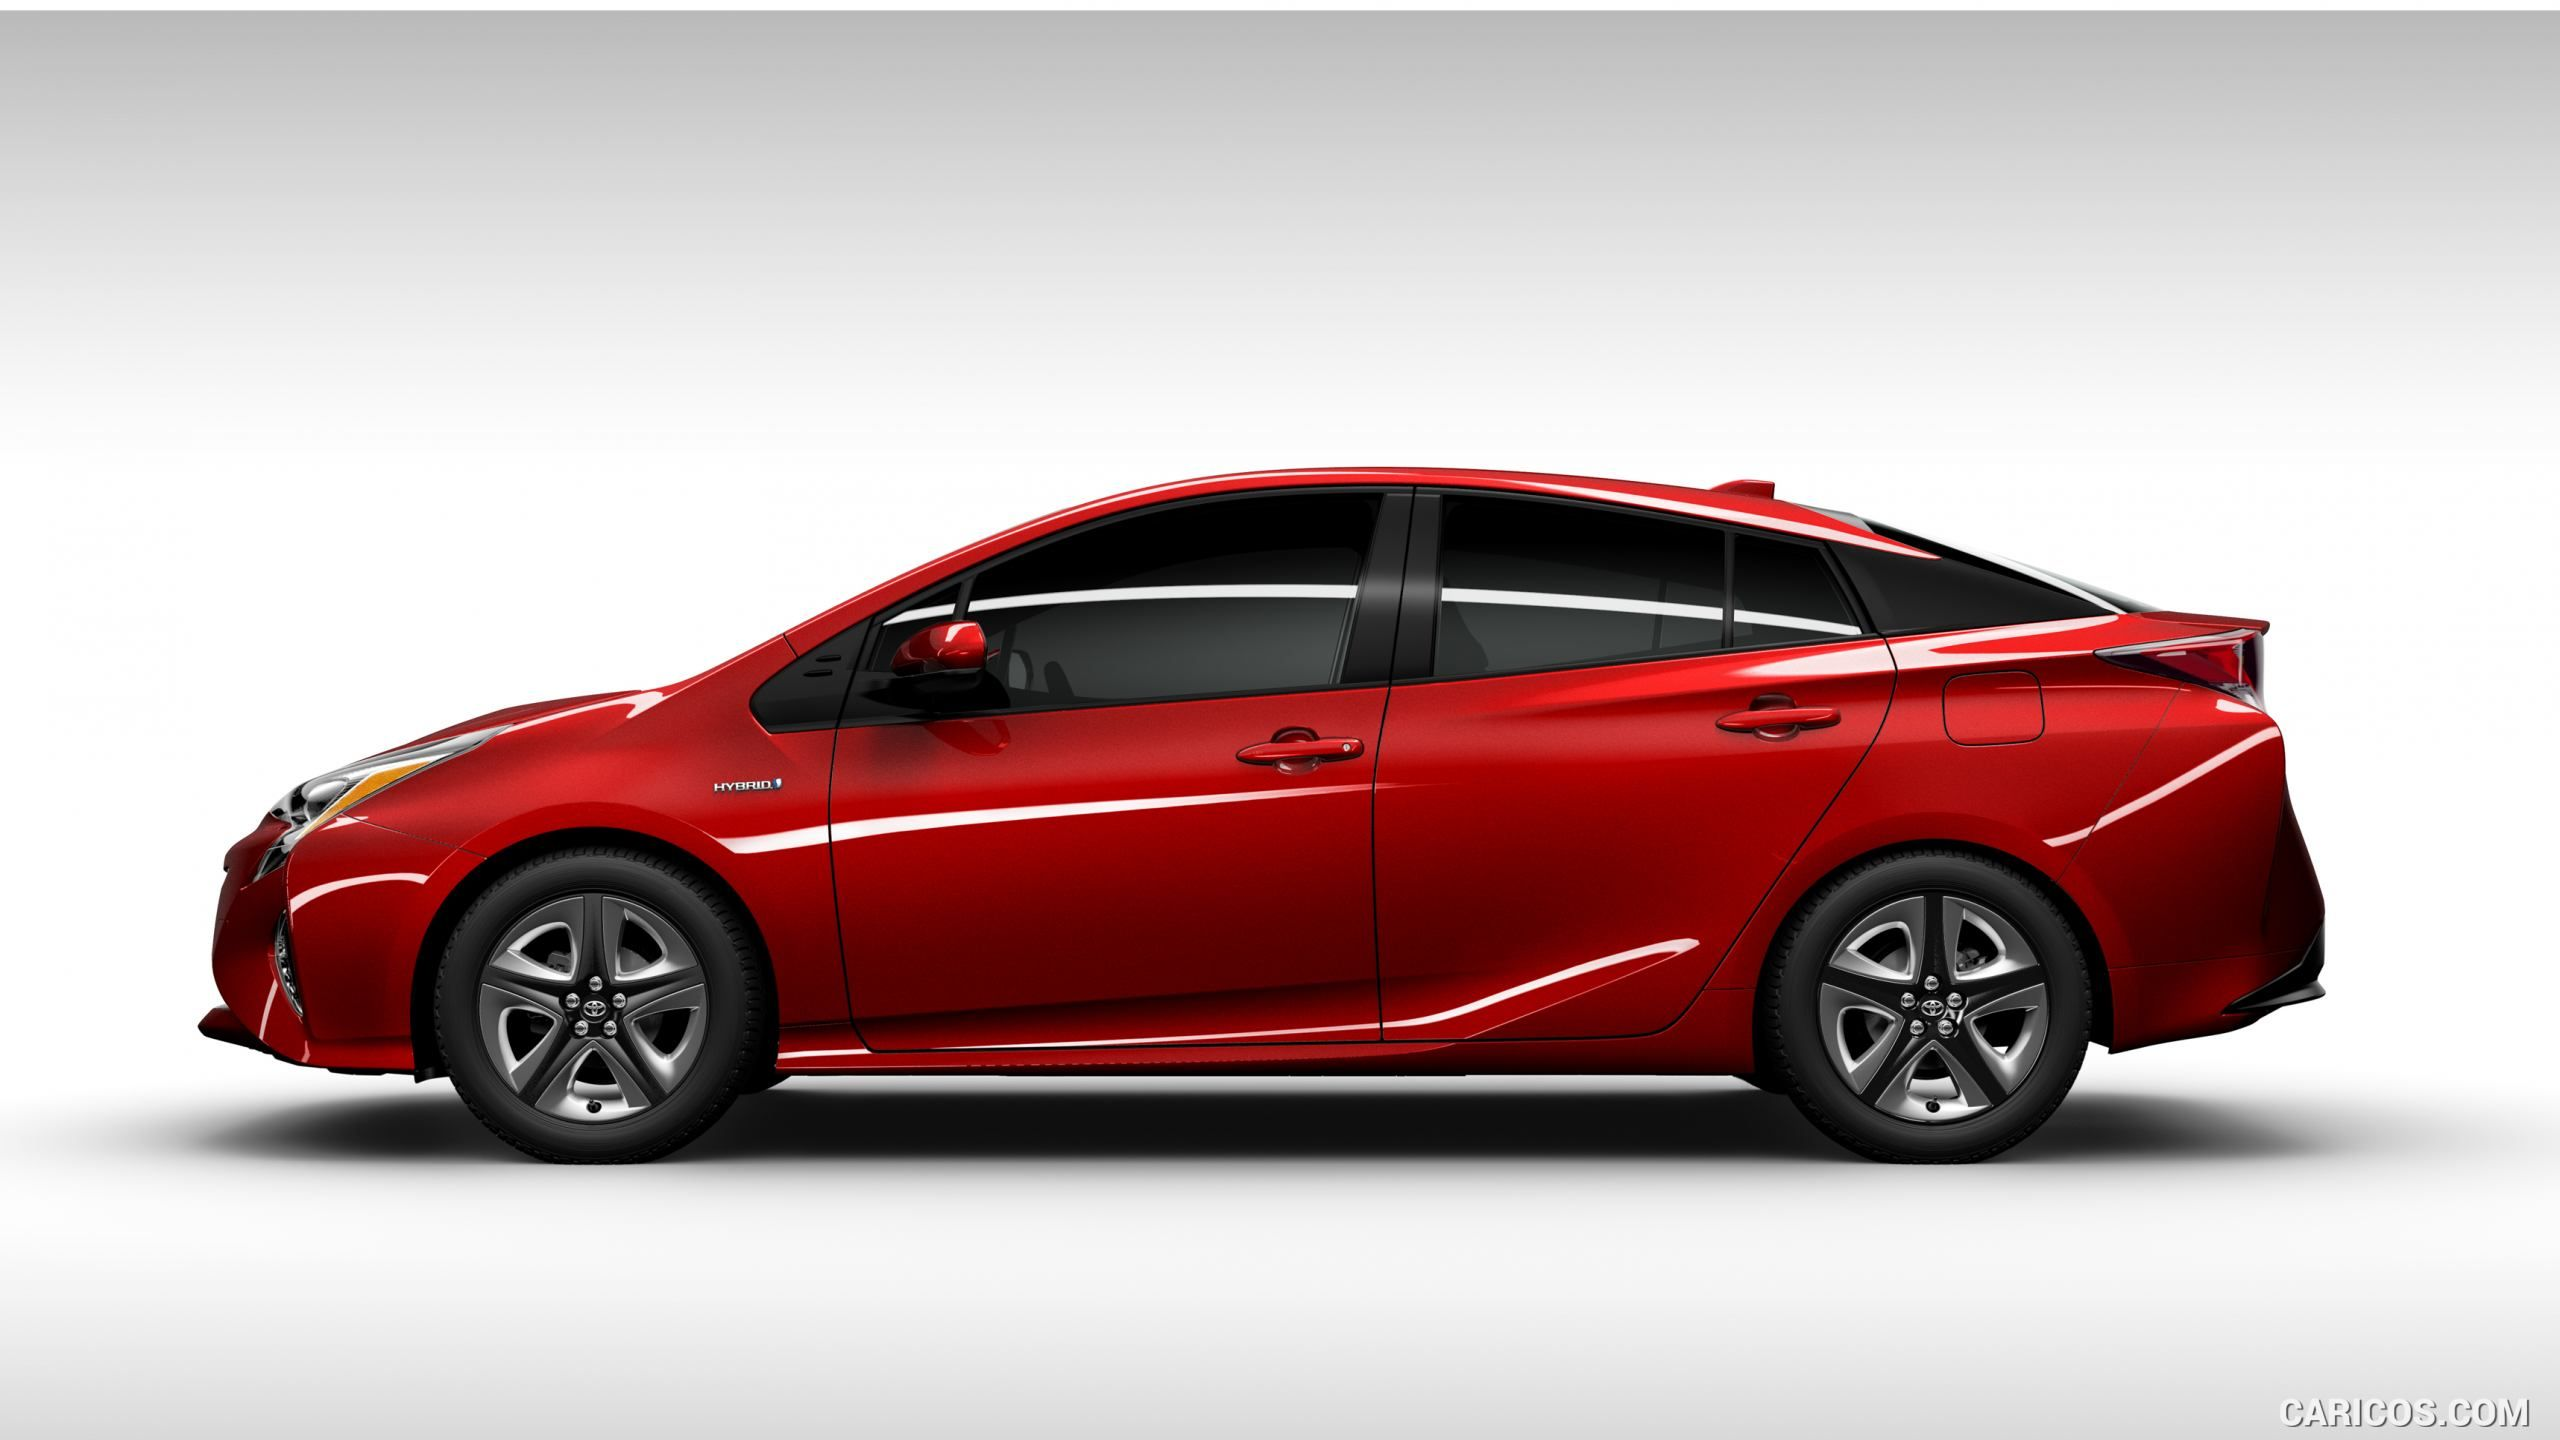 Toyota prius v 2015 toyota canada cars pinterest toyota canada toyota prius and toyota